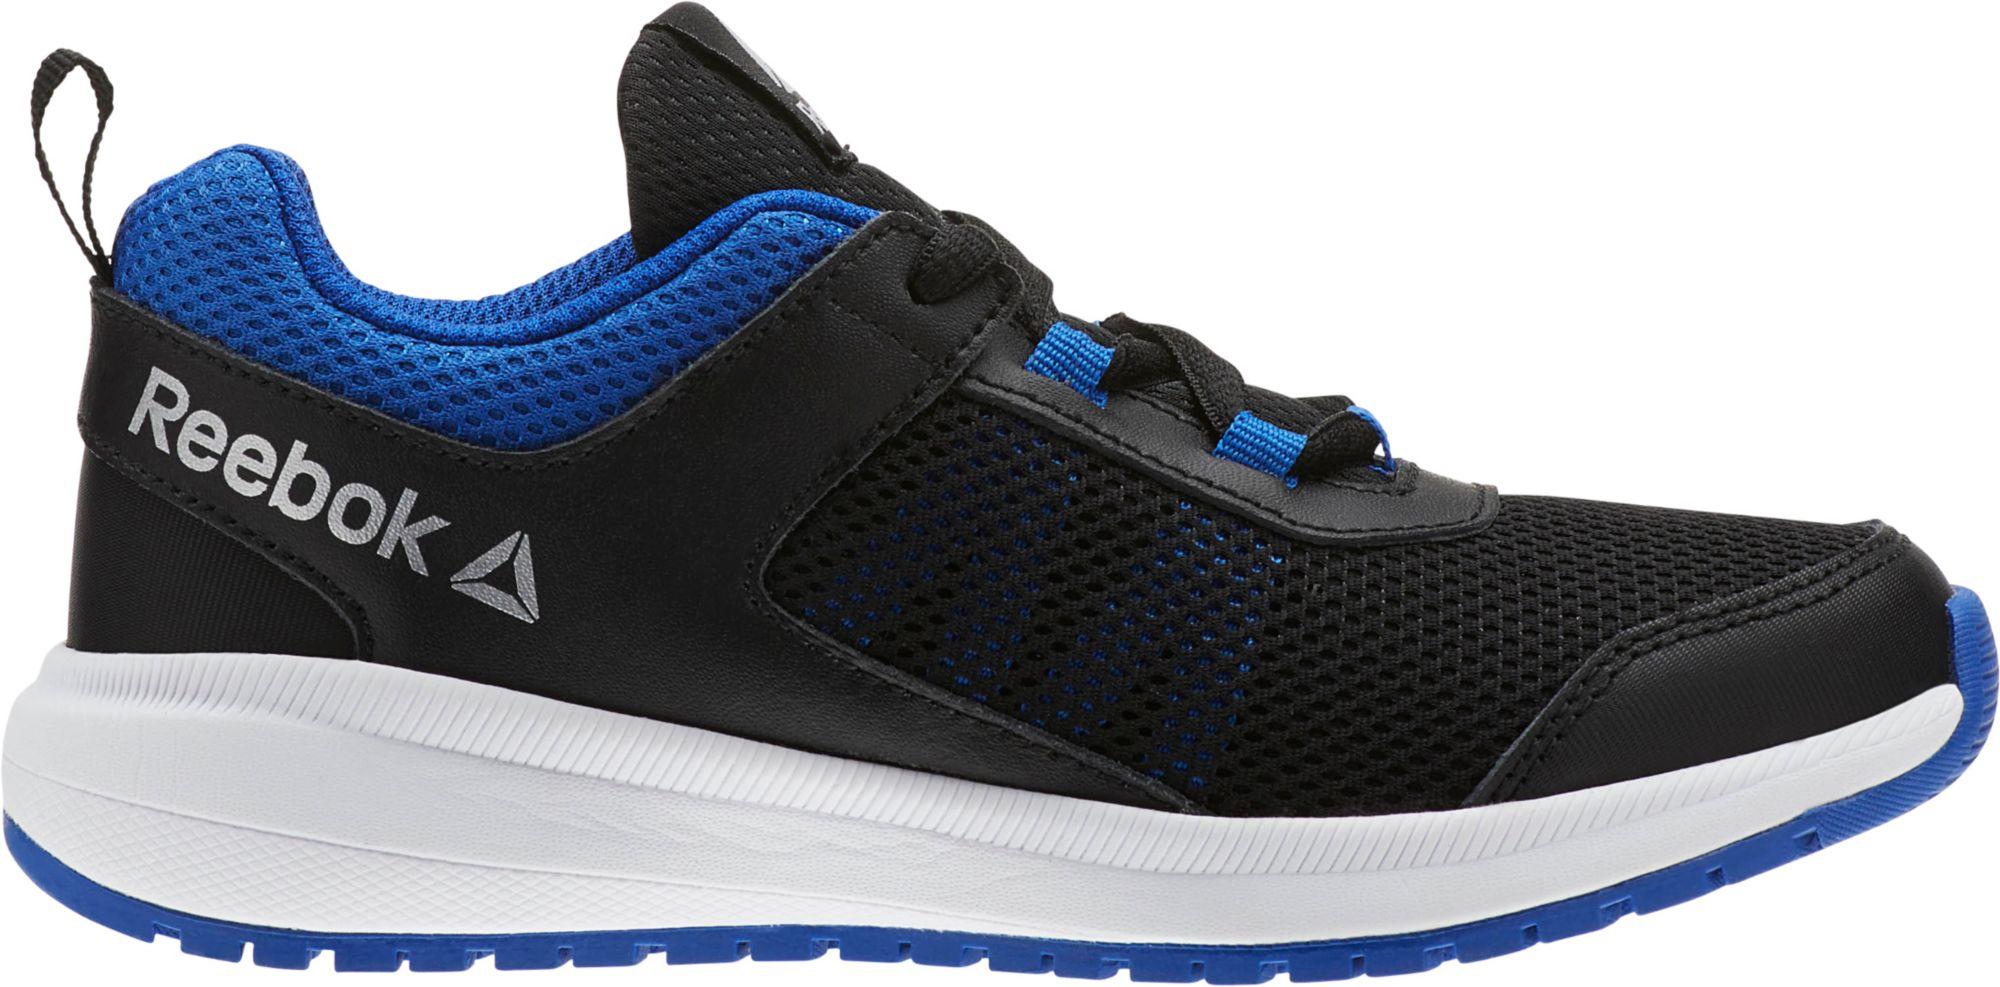 b3645c4e23e1 Reebok Kids Road Supreme Running Shoes (Various Styles) - Slickdeals.net